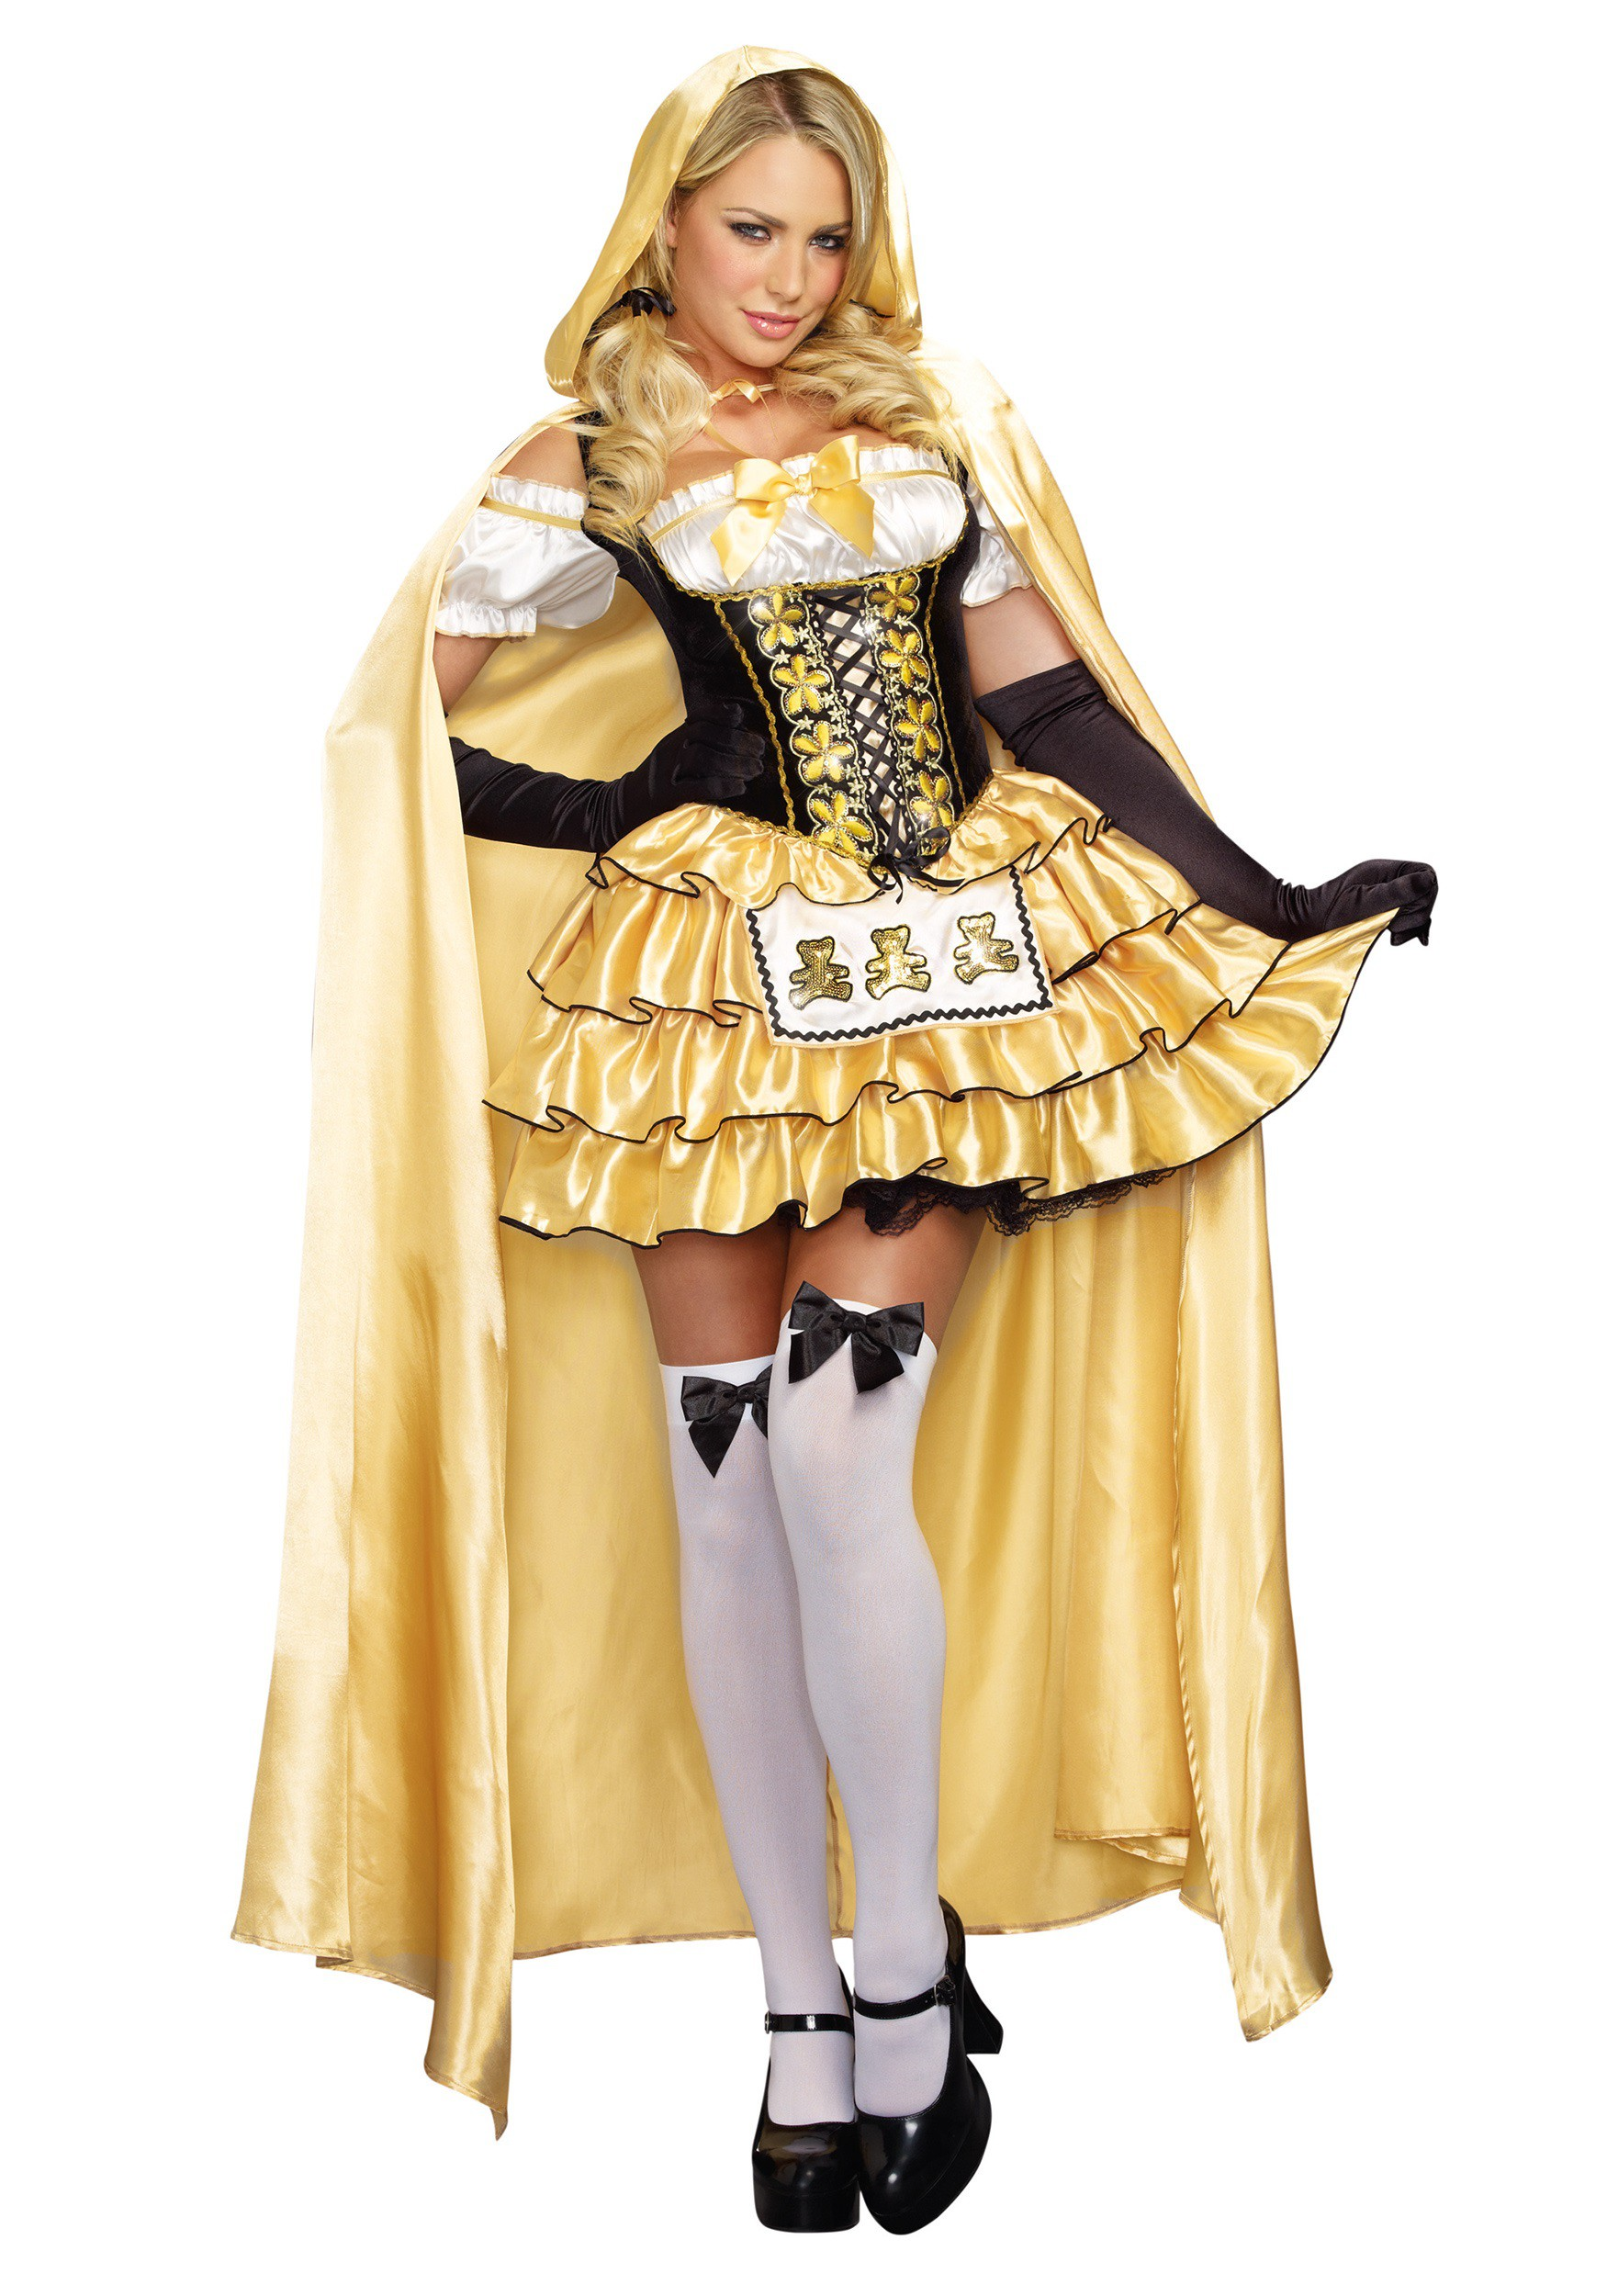 Goldilocks Costumes